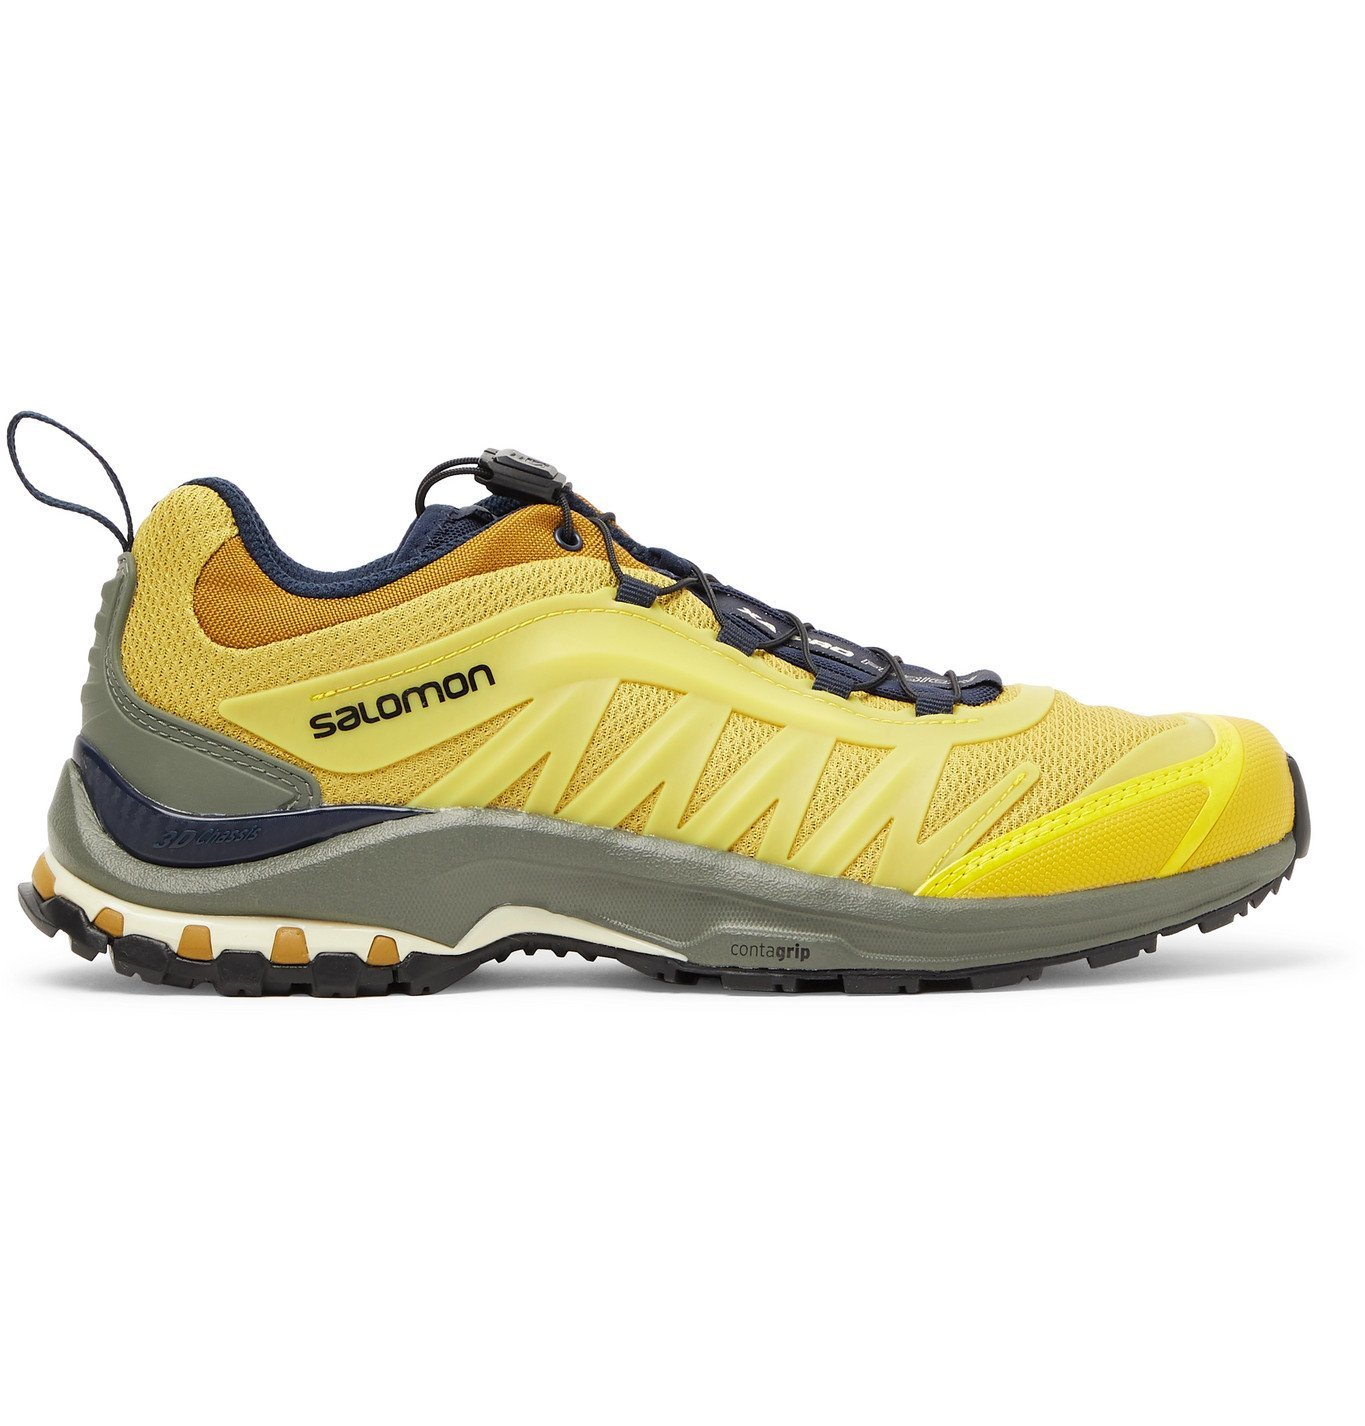 Photo: Salomon - XA-Pro Fusion Advanced Mesh and Rubber Running Sneakers - Yellow